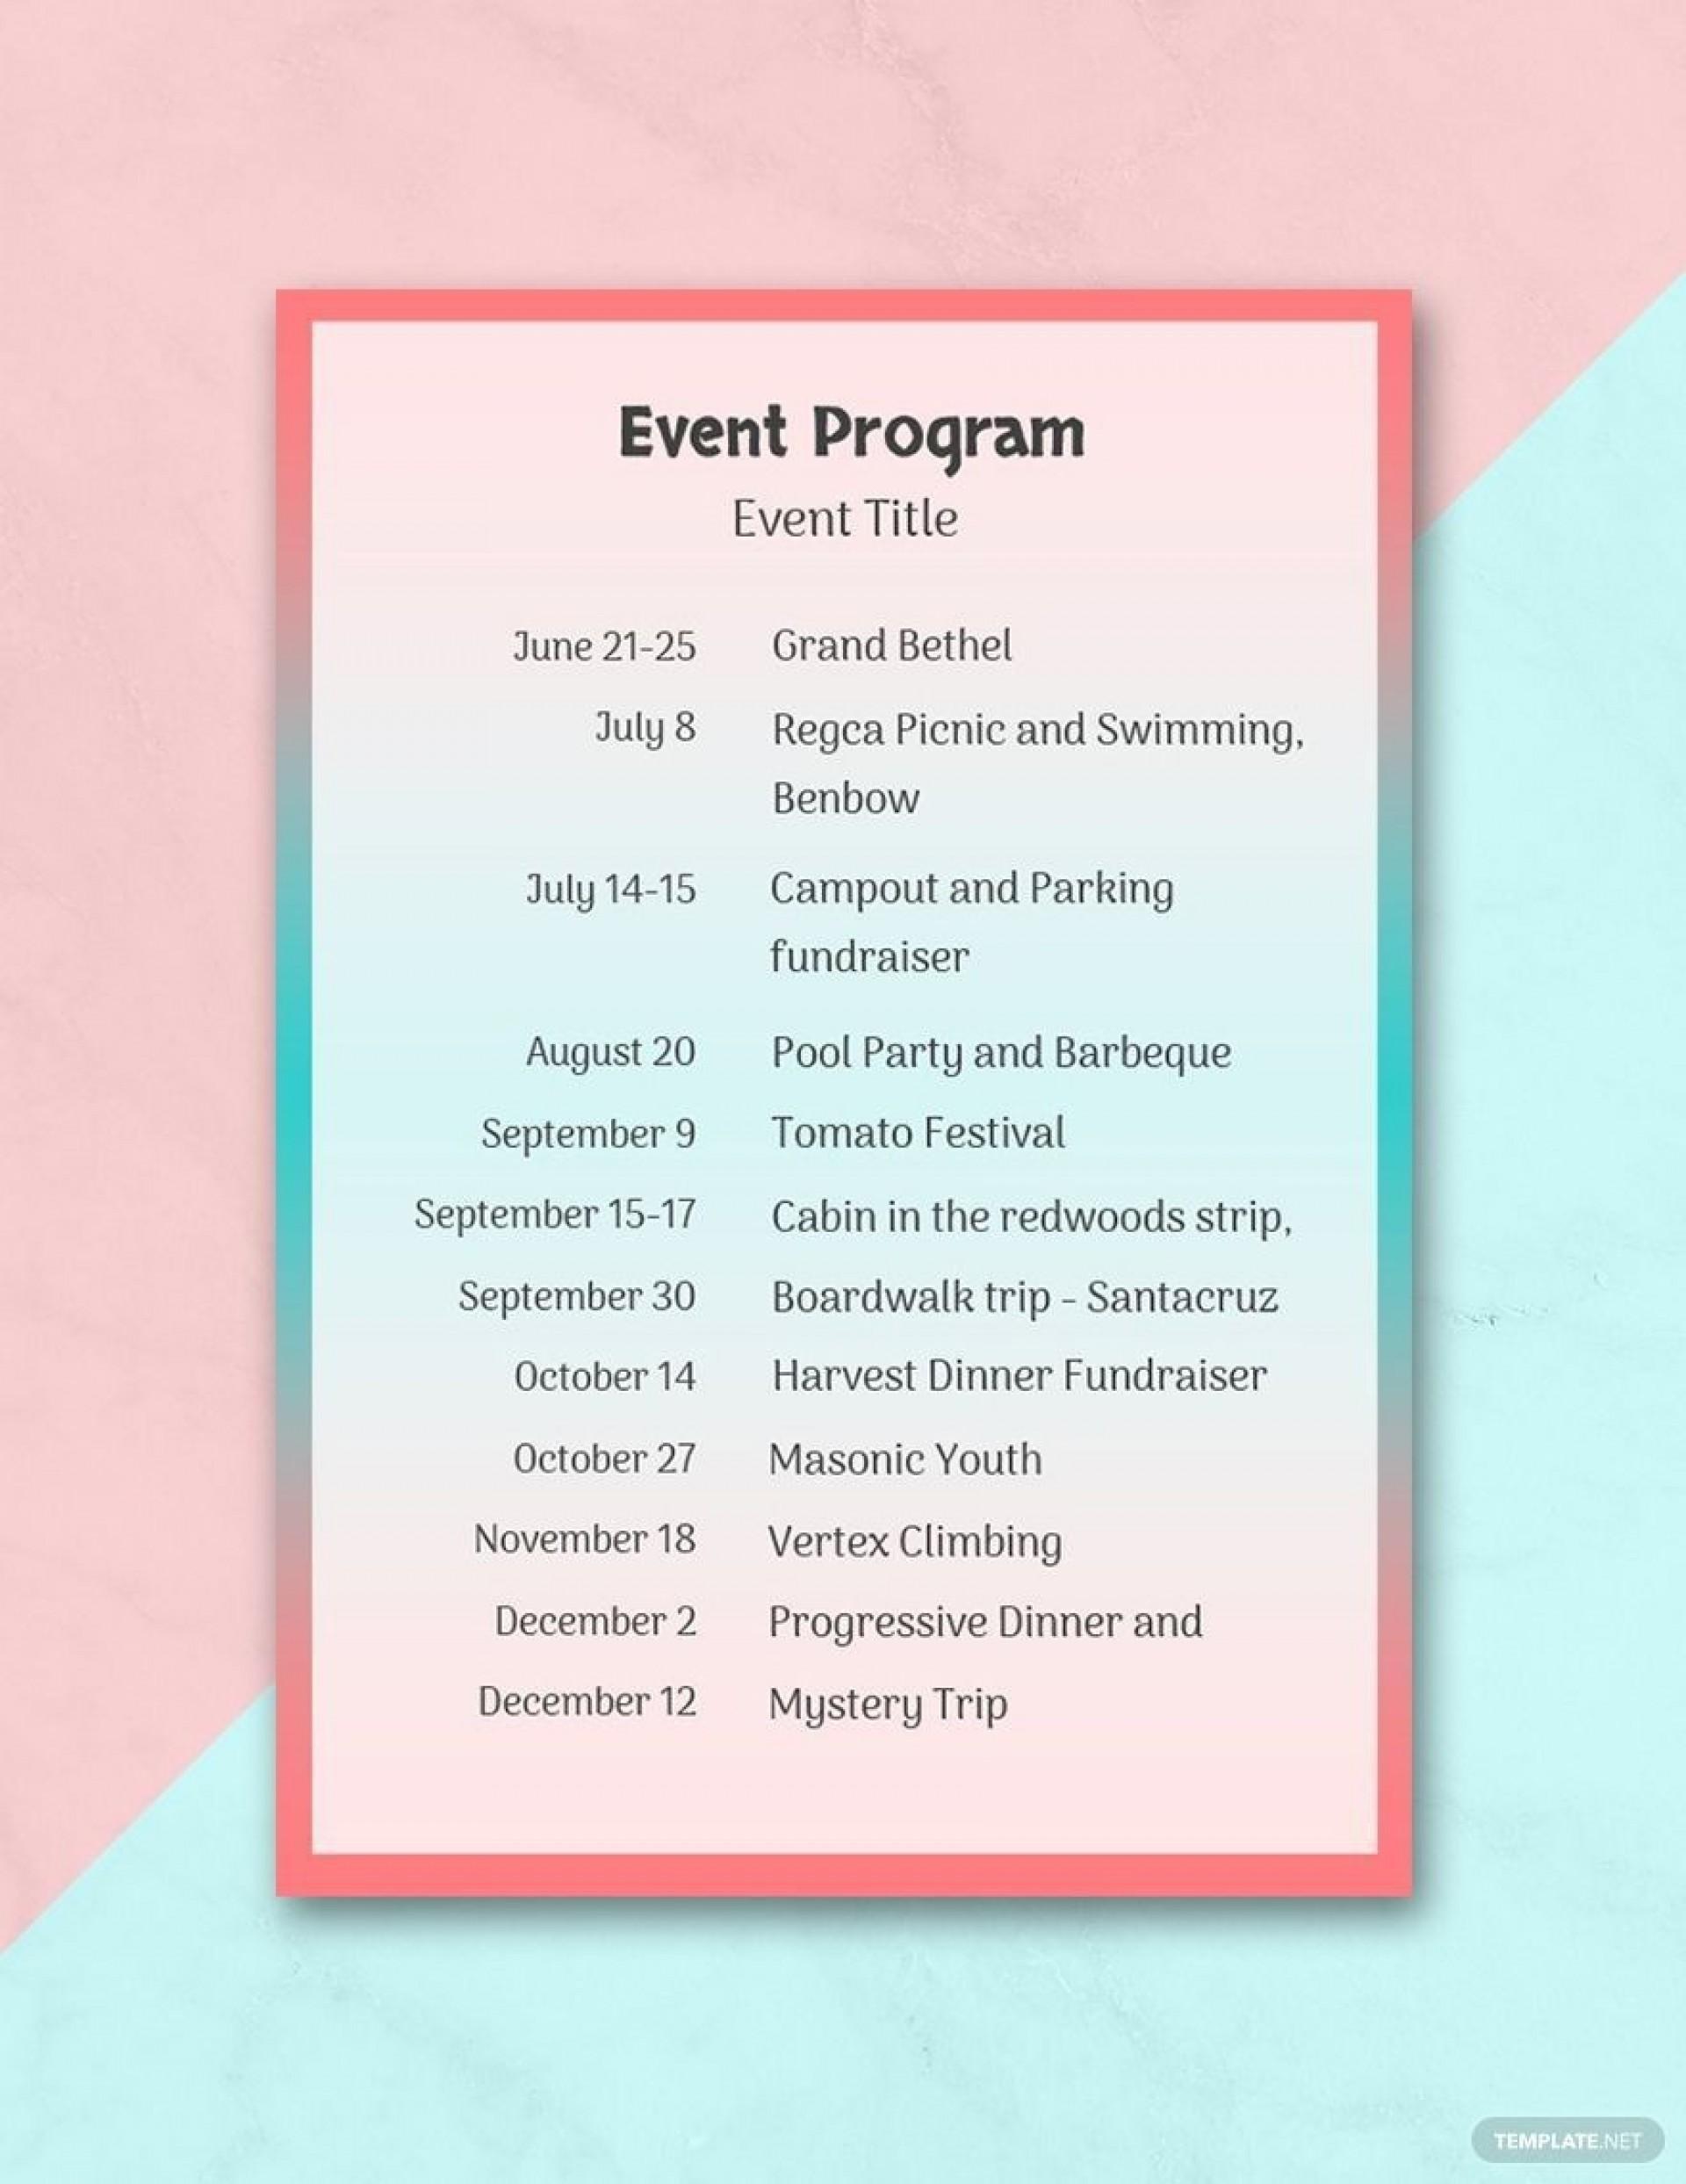 001 Impressive Printable Event Program Template Picture  Free Download1920